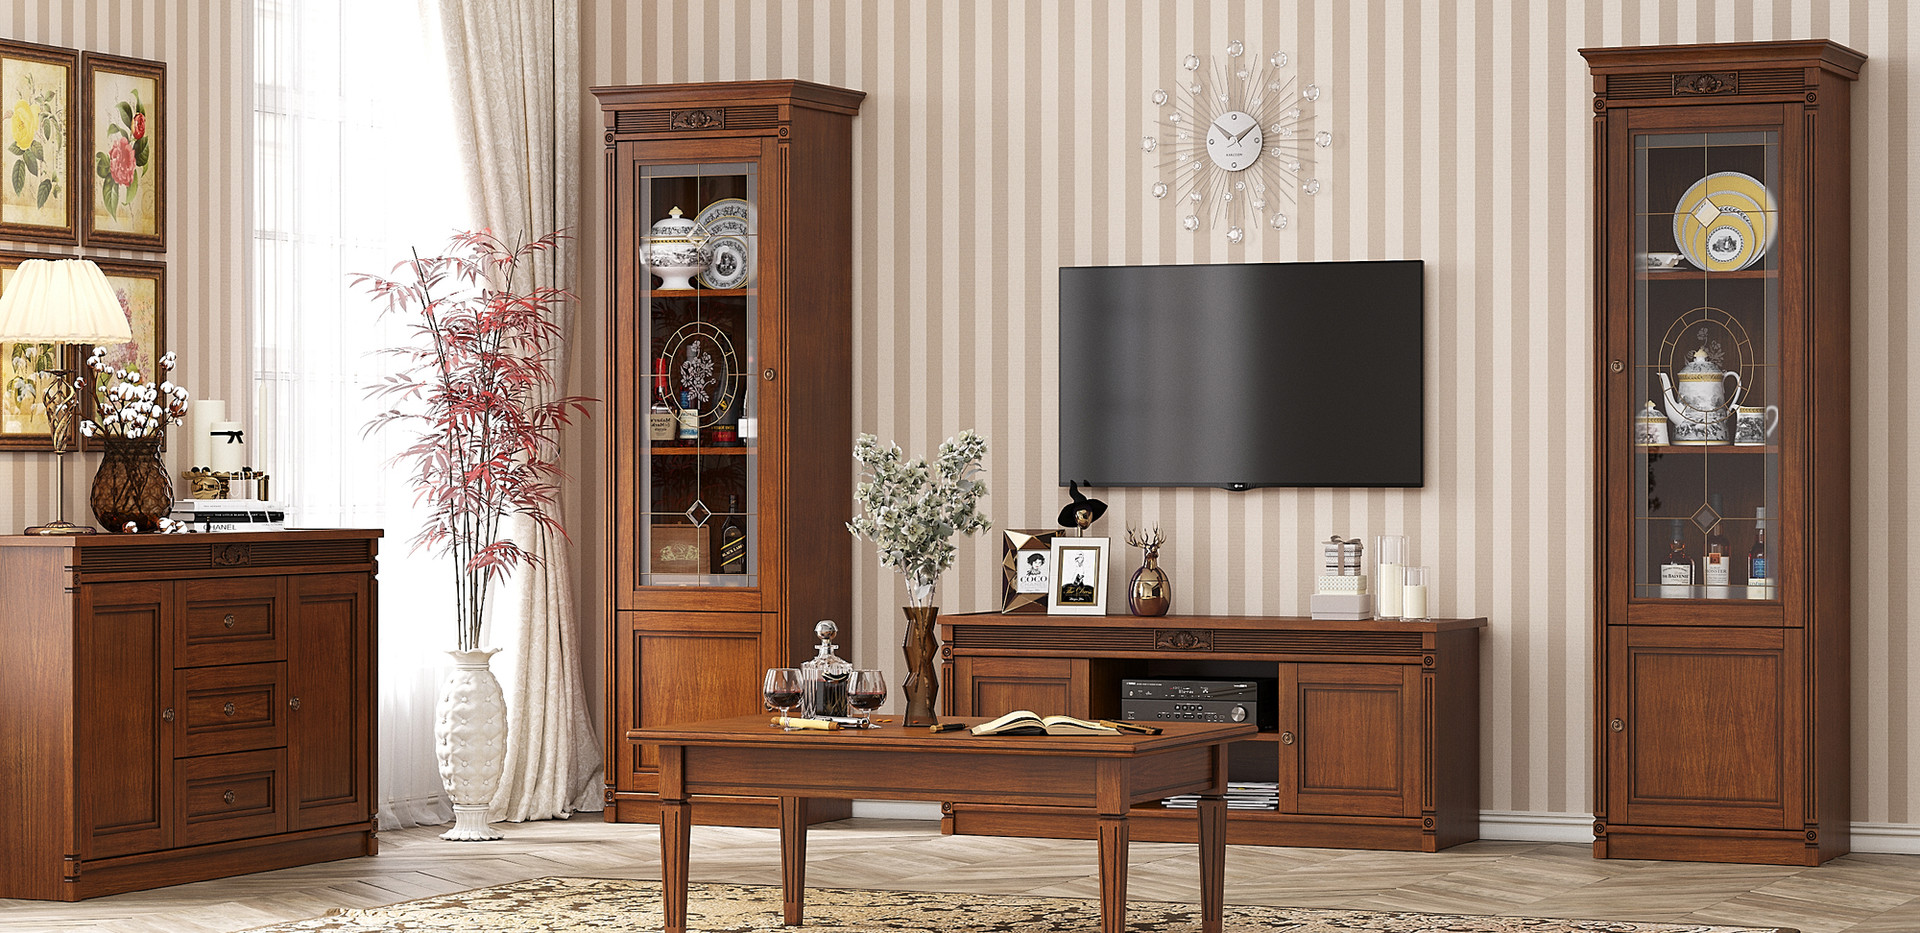 MARSELLE_Living room_02.jpg